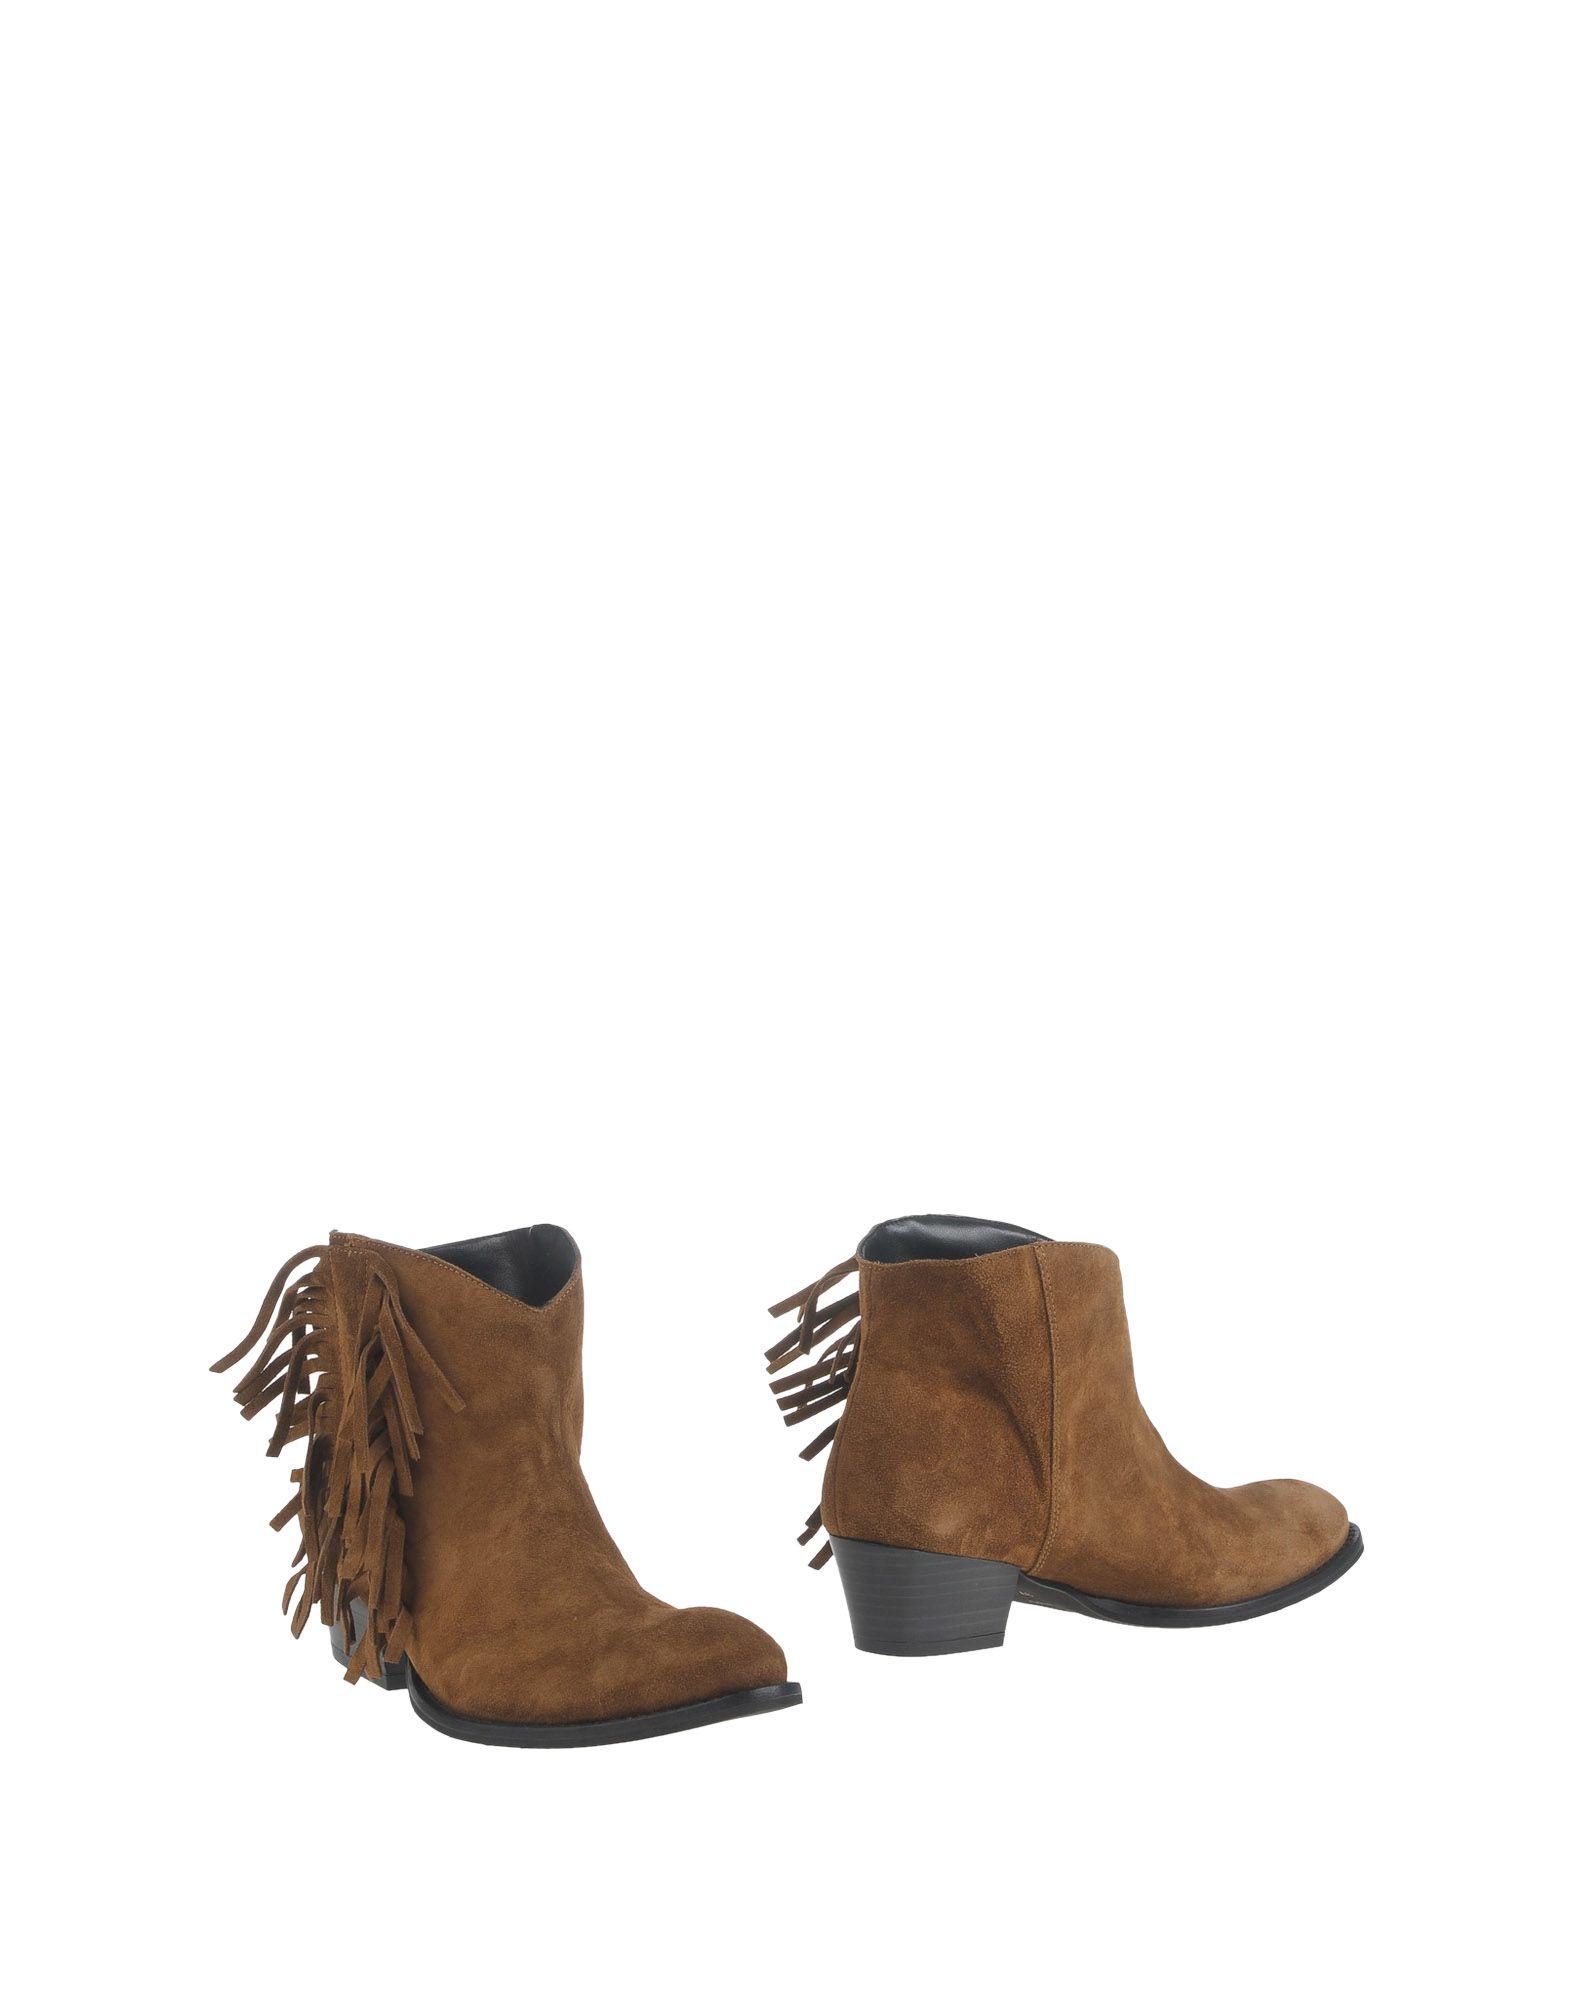 ISLO ISABELLA LORUSSO Полусапоги и высокие ботинки цены онлайн